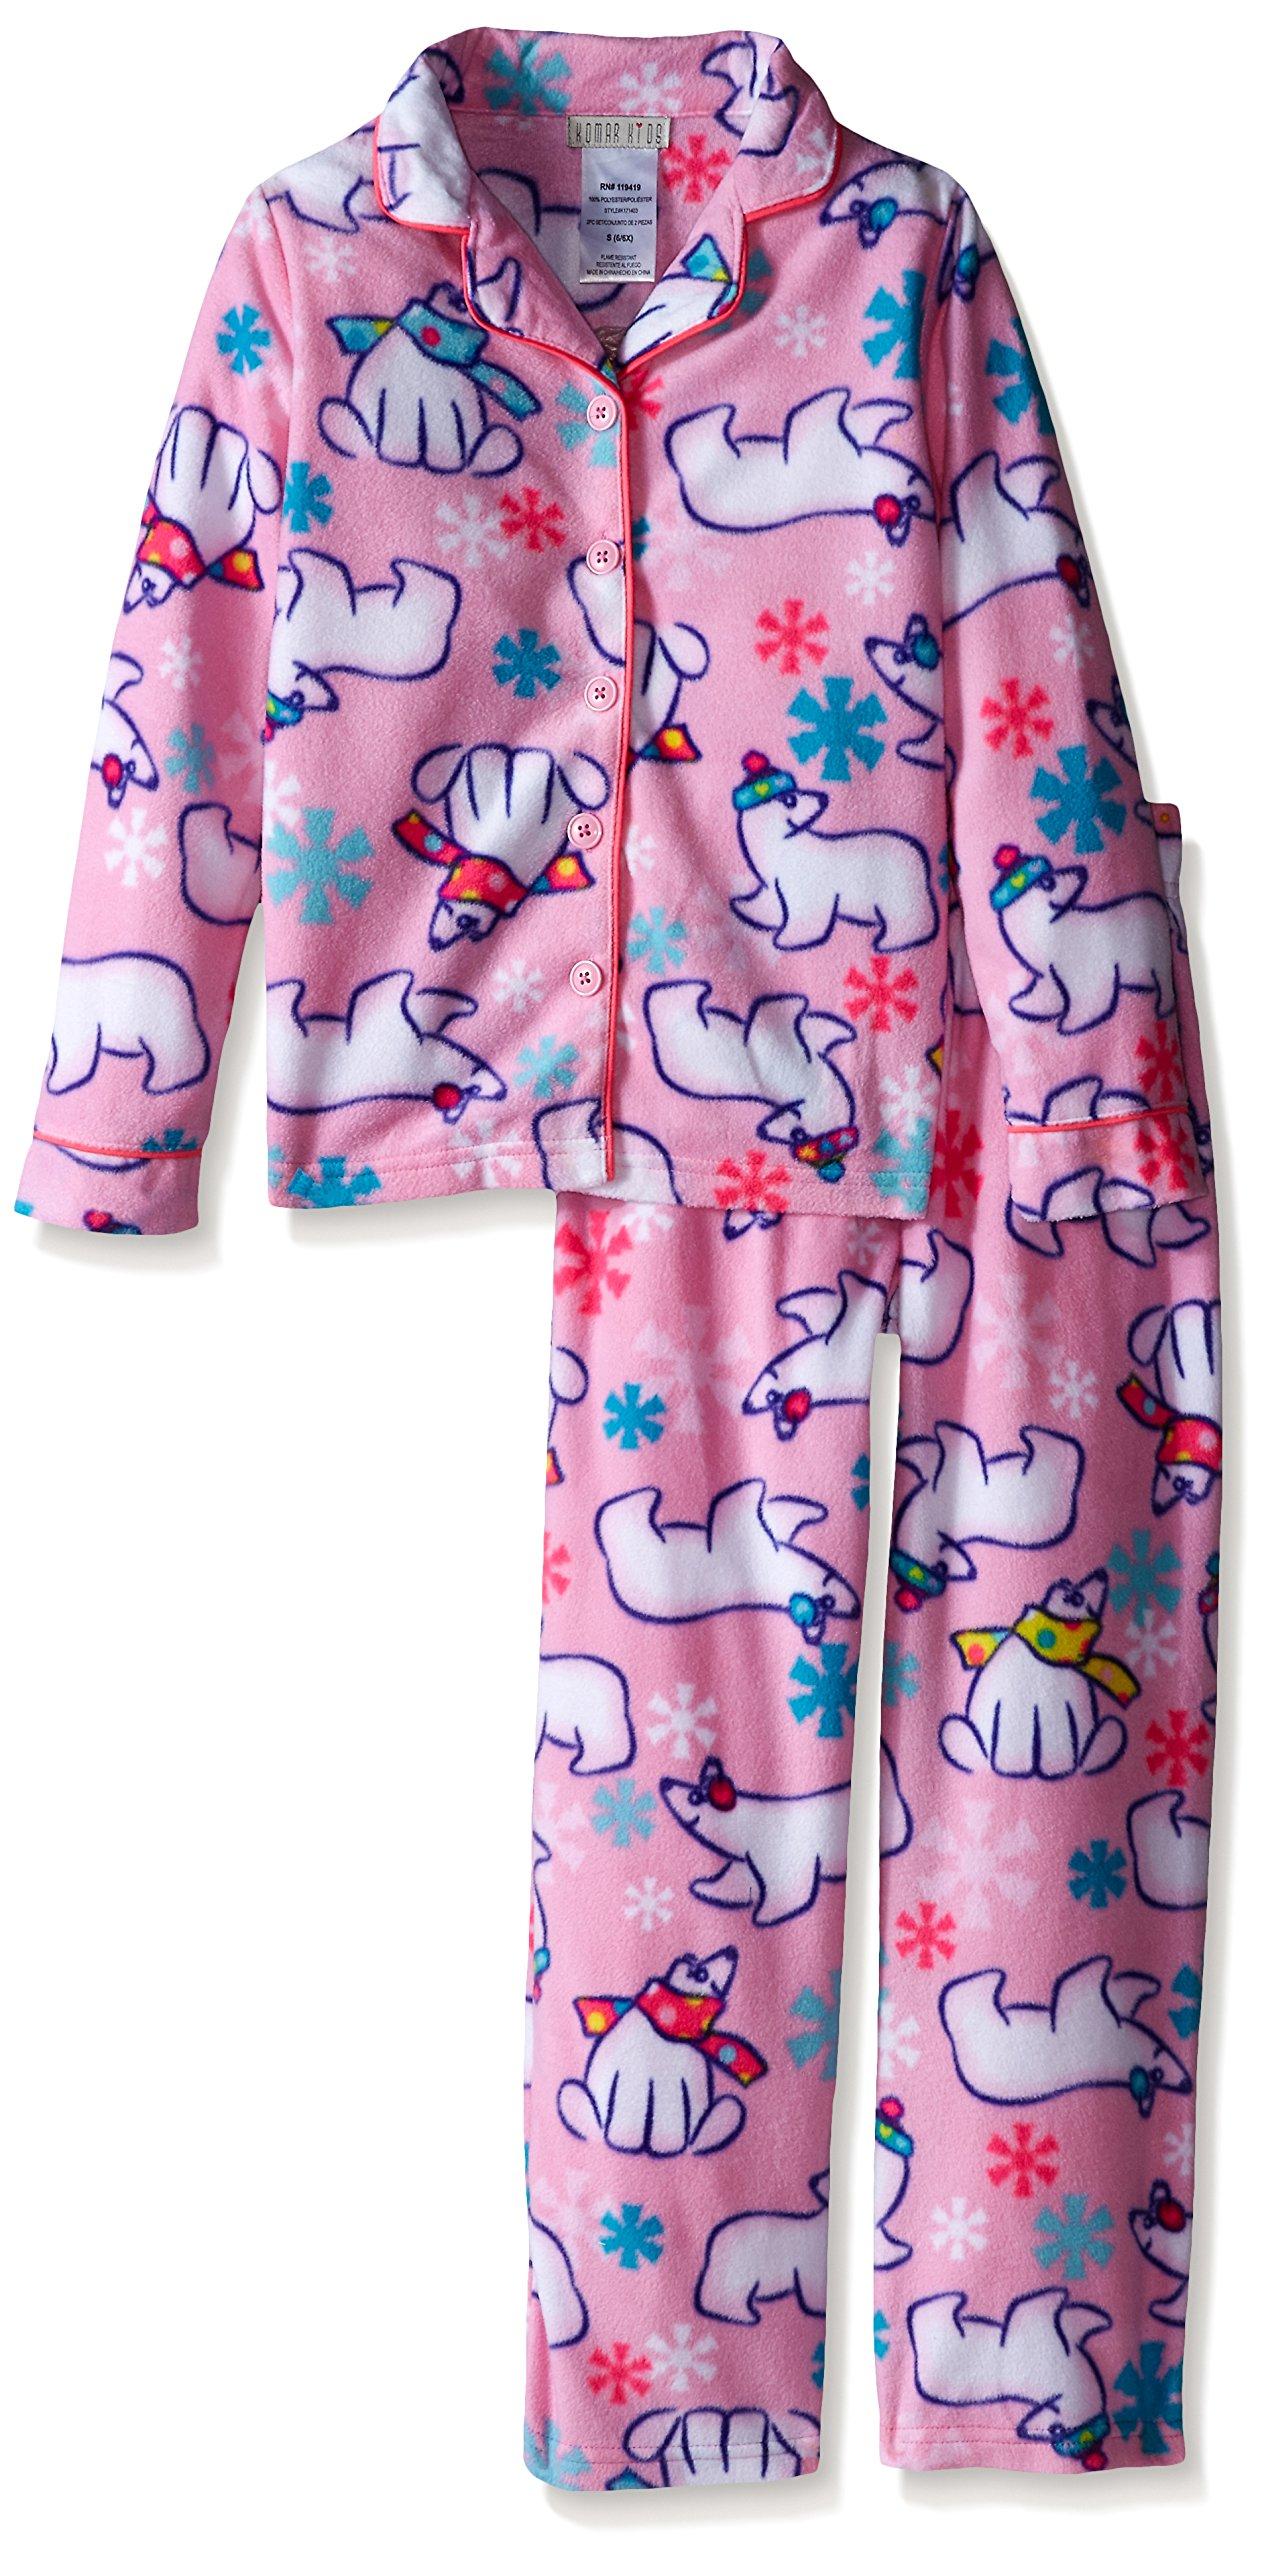 Komar Kids Big Girls' Micro Fleece 2 Piece Polar Bear Coat Set, Pink, X-Small